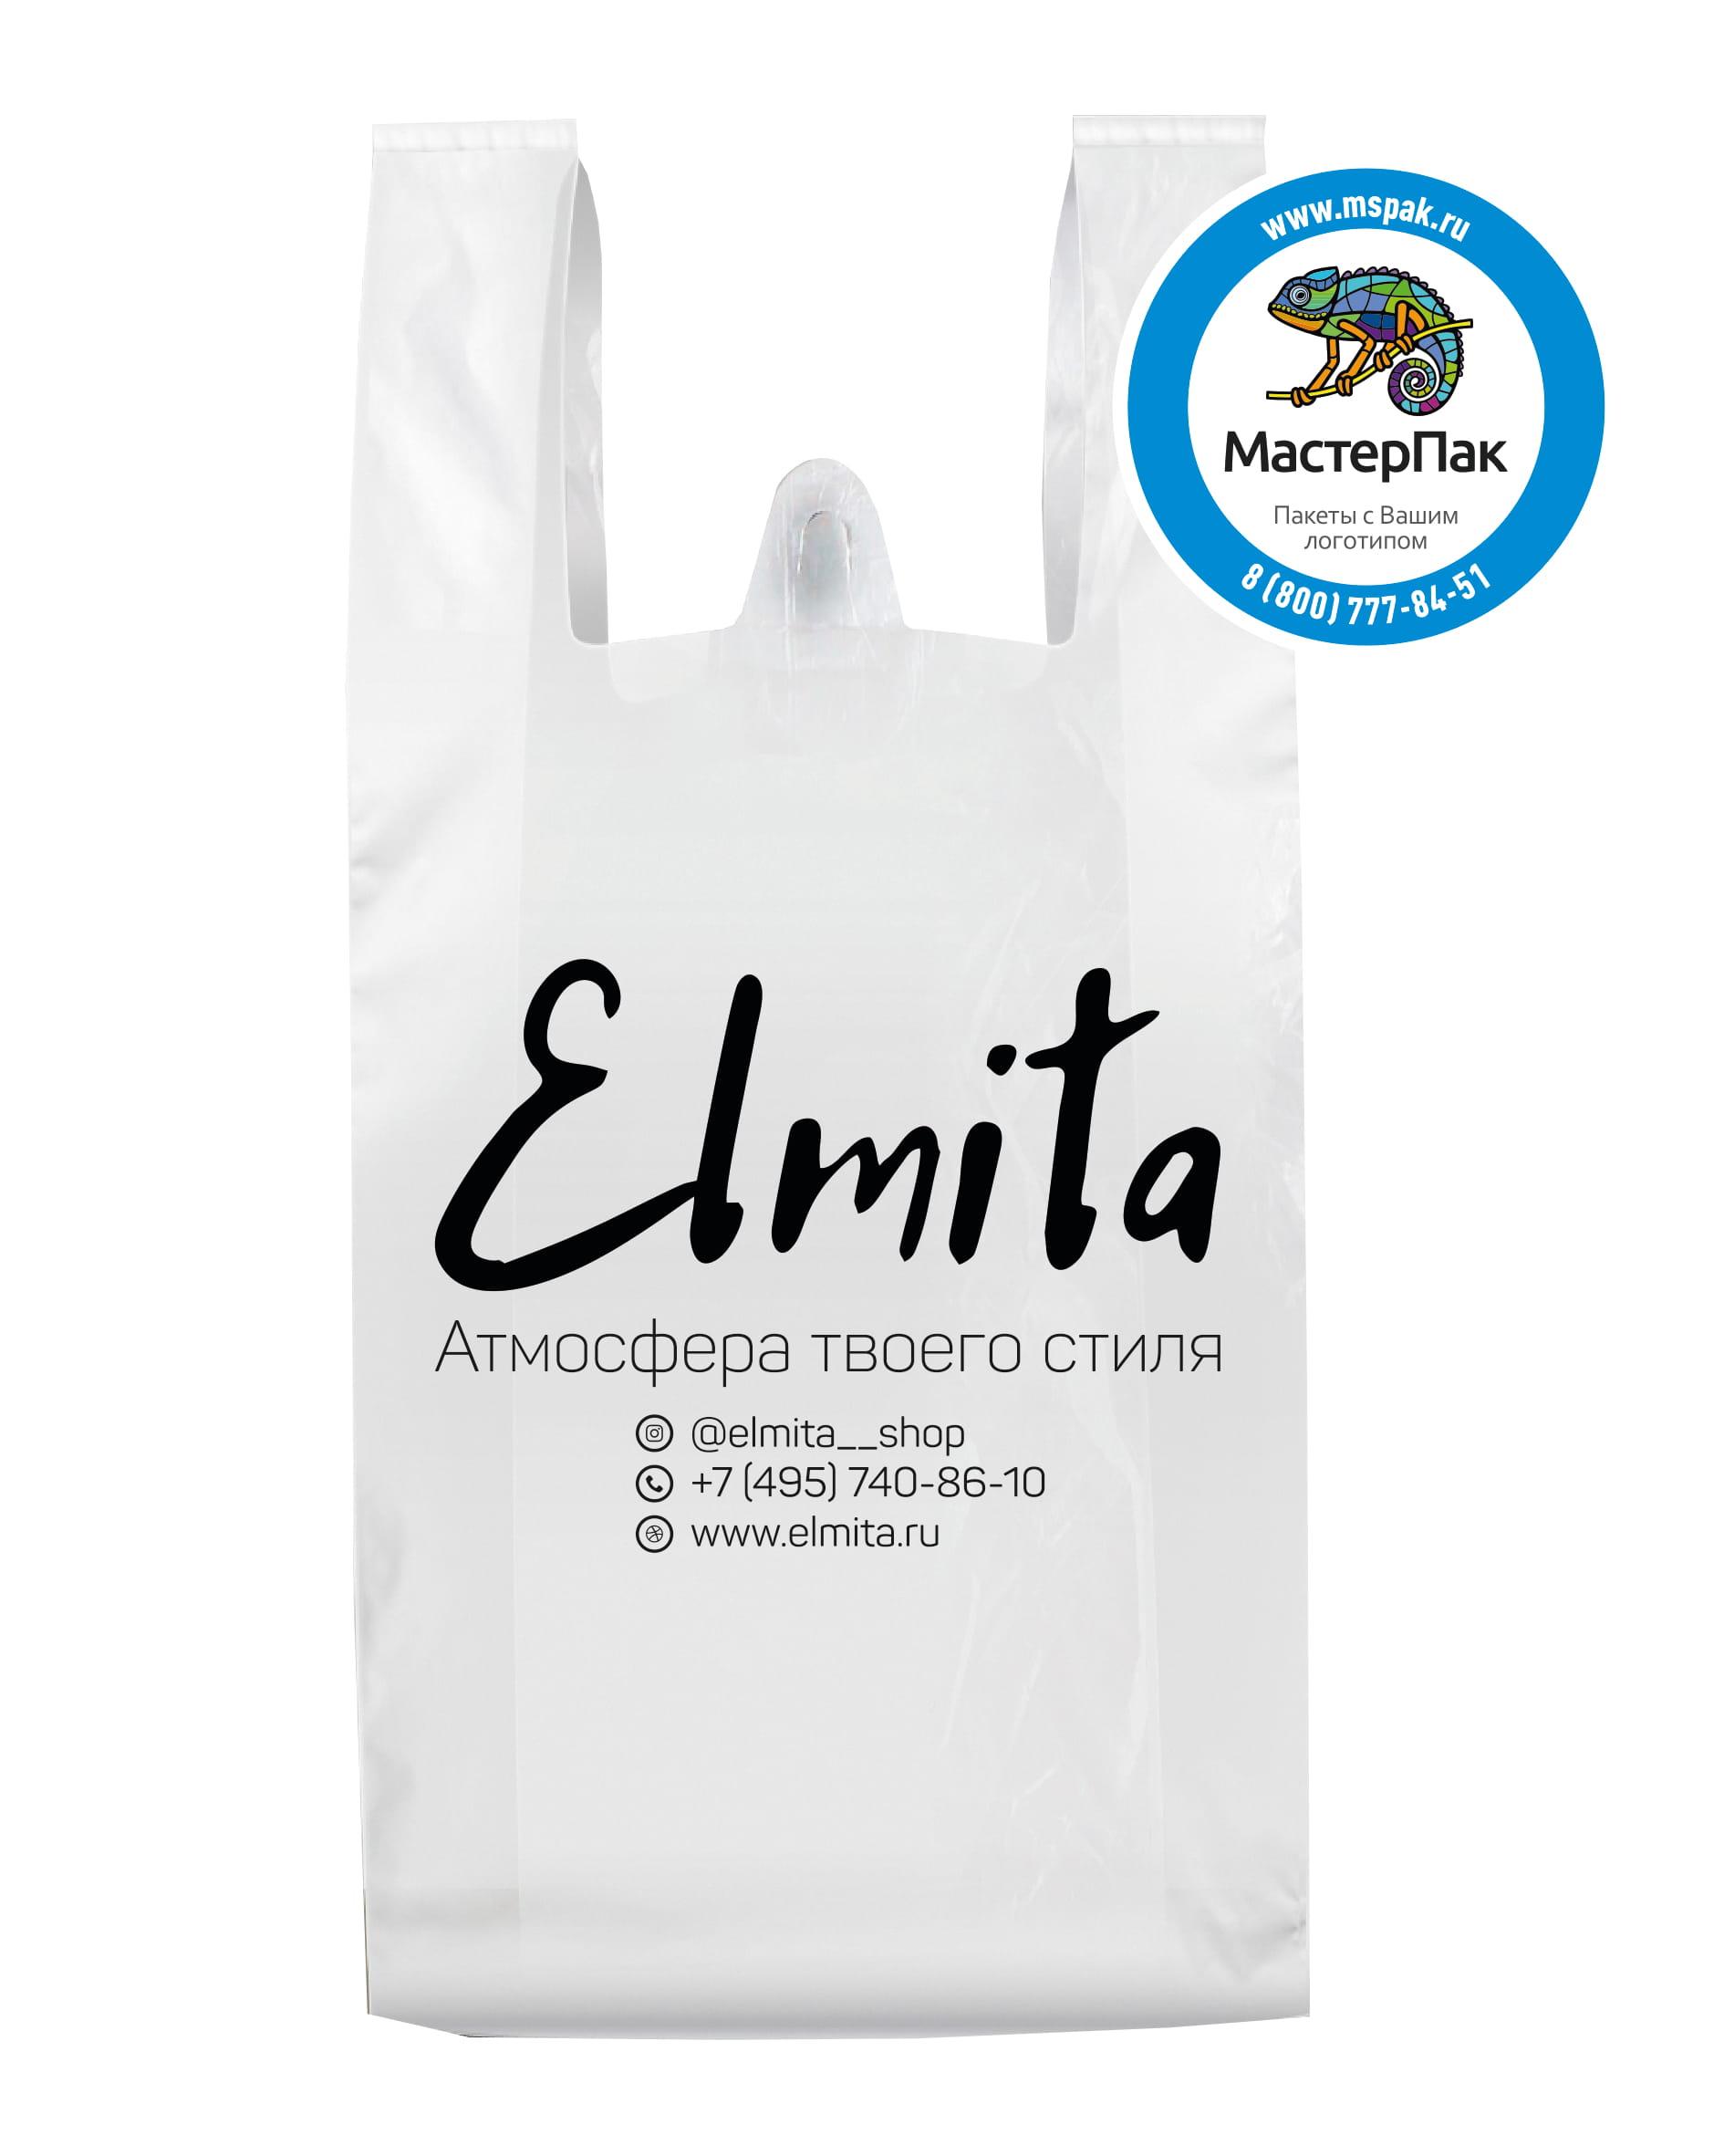 Пакет-майка ПНД с логотипом Elmita, 28 мкм, 40*60, Москва